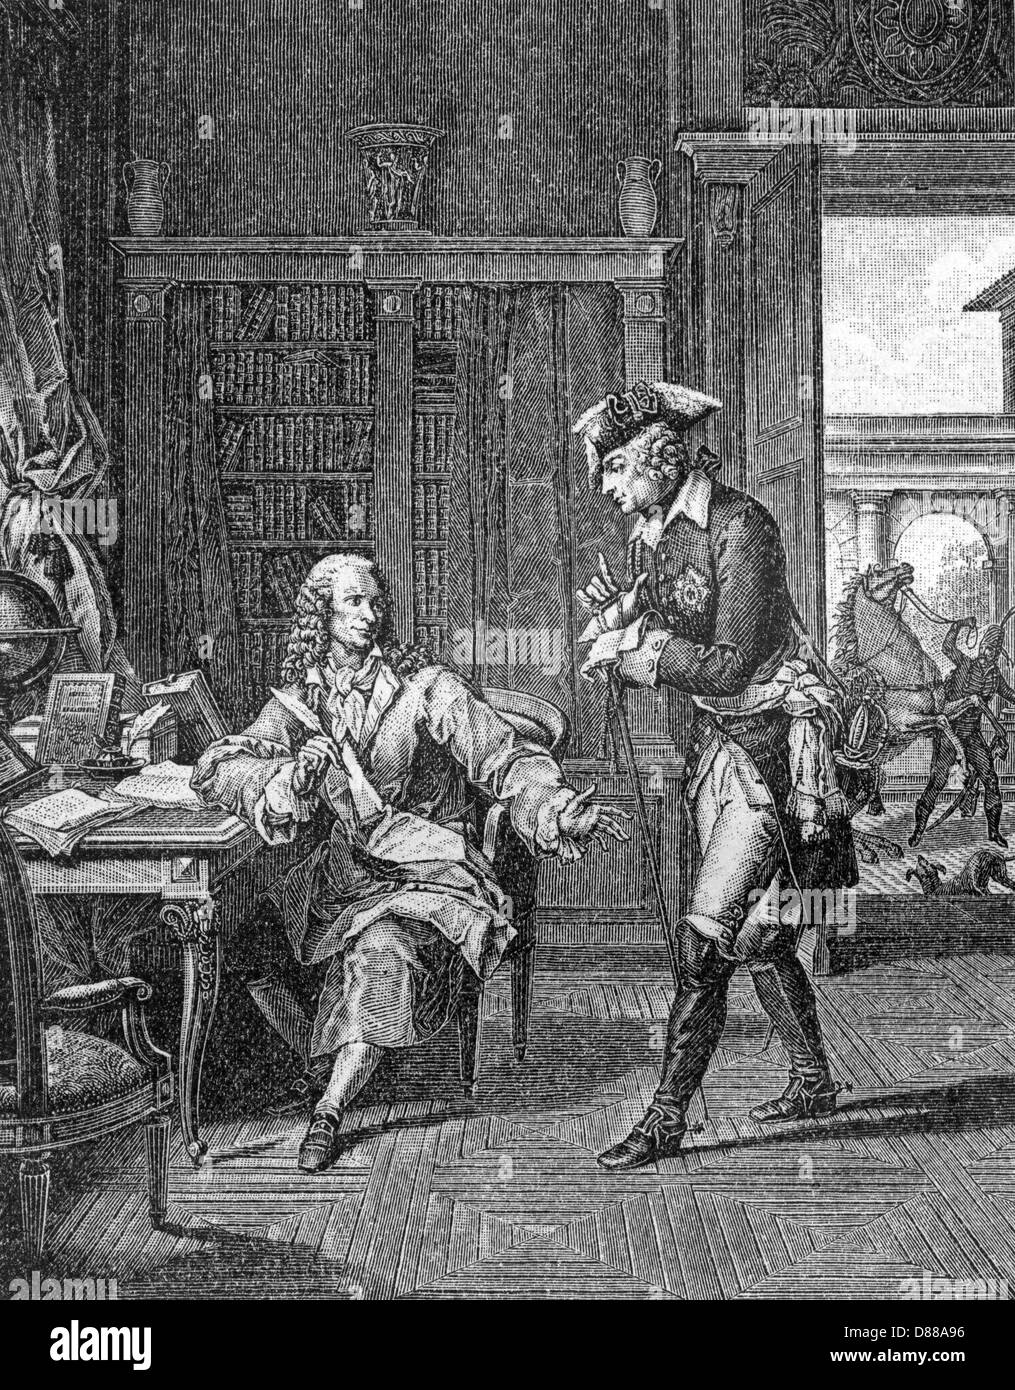 Voltaire + Friedrich gt. Stockbild